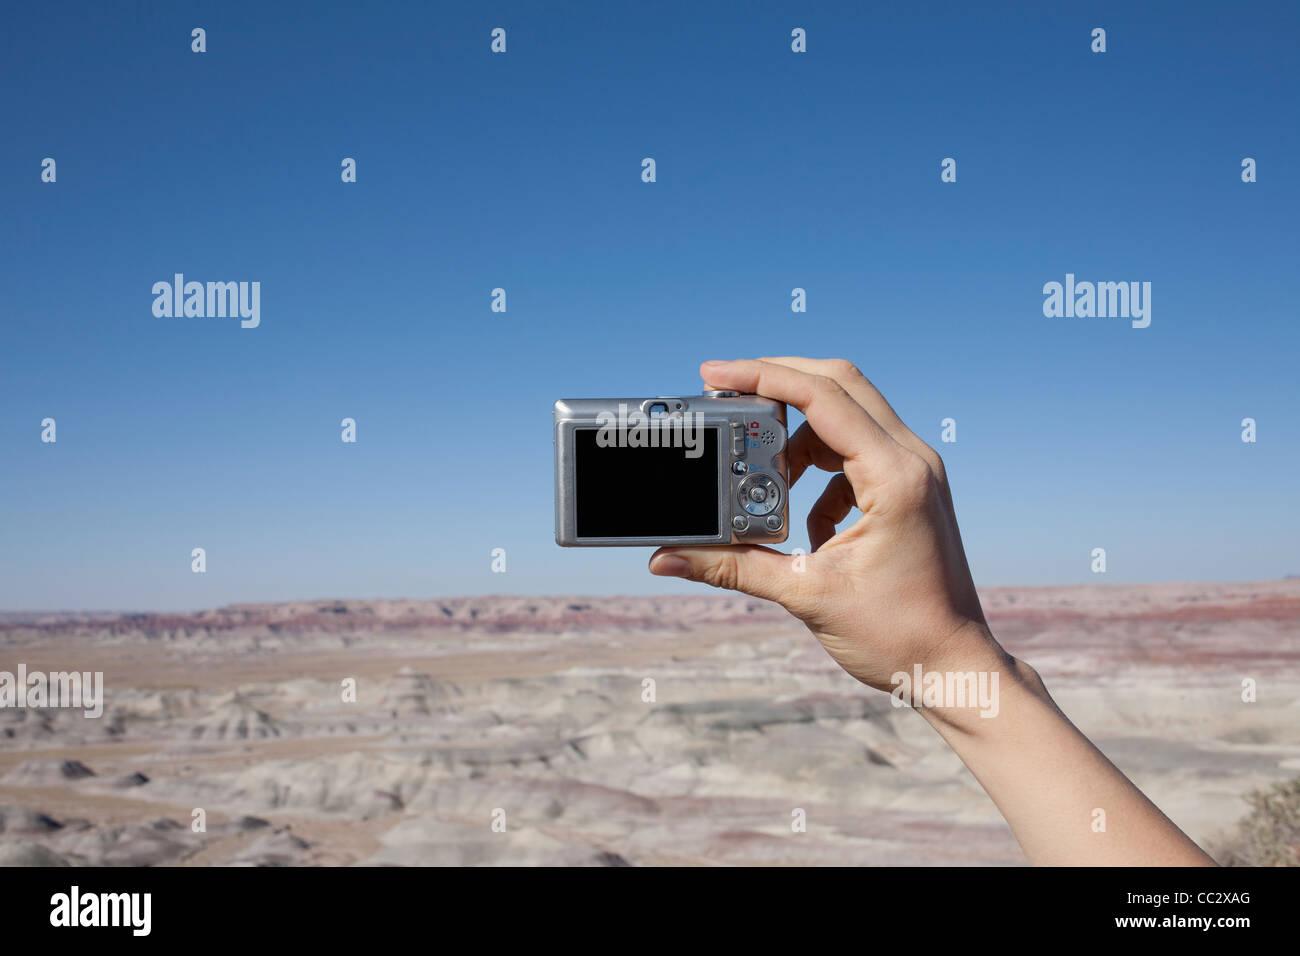 Snapshot Blue Stockfotos & Snapshot Blue Bilder - Alamy